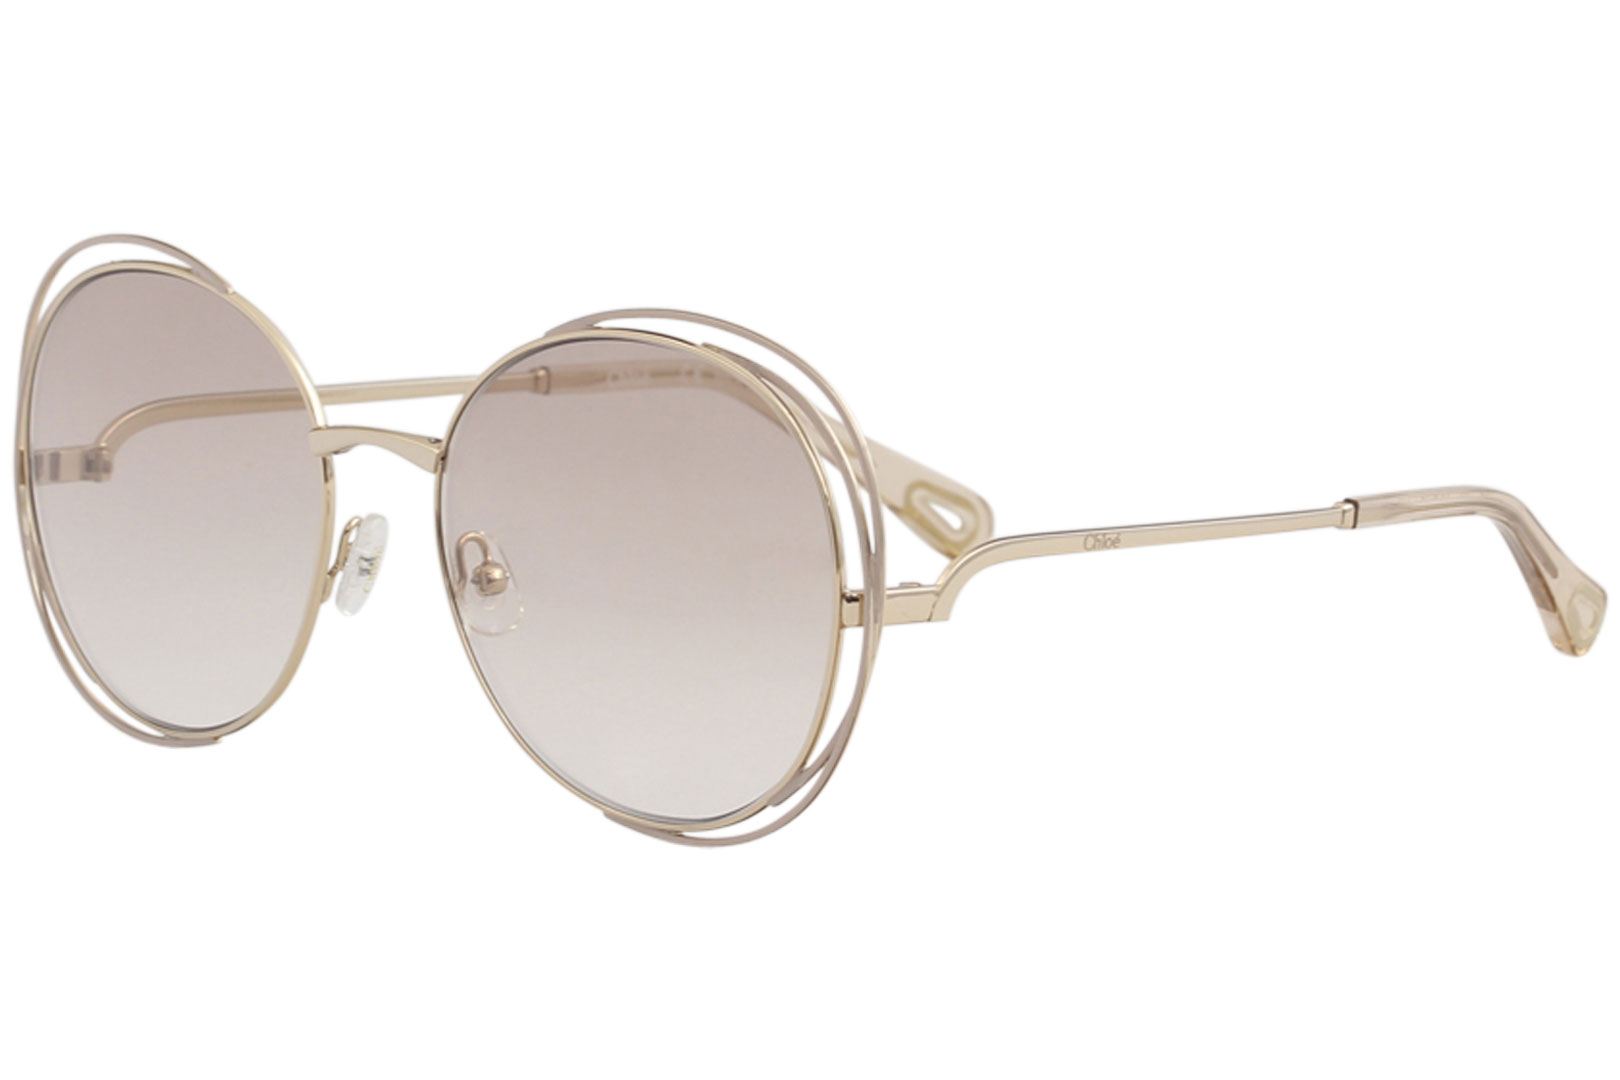 28f6c9c9013d Chloe Women s CE2138 CE 2138 825 Gold Pink Fashion Round Sunglasses ...